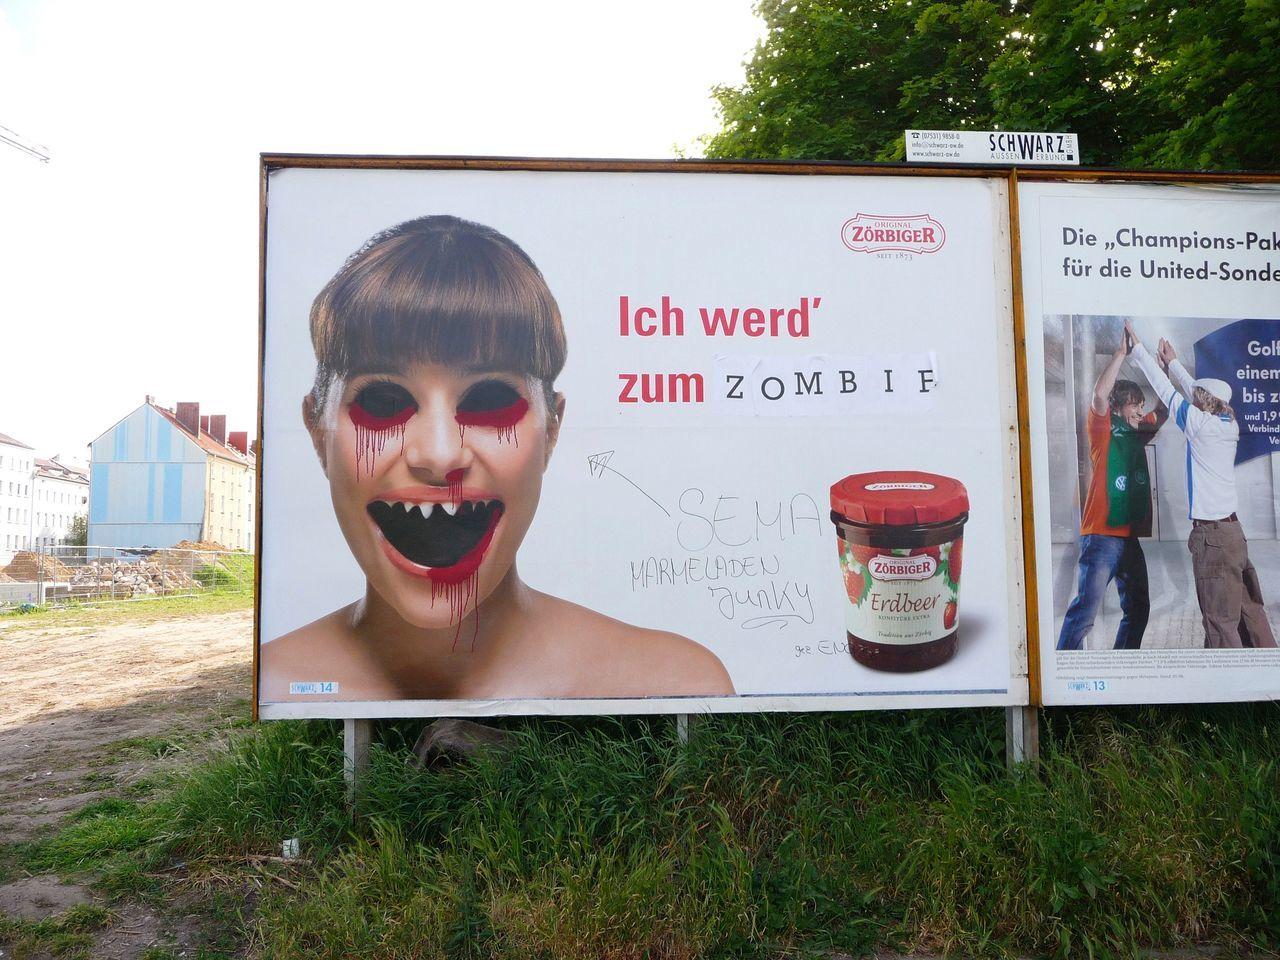 GERMANY🇩🇪DEUTSCHERLAND@ 2008 May Berlin Mitte Advertising Poster Billboard Graffiti Zombie Jam